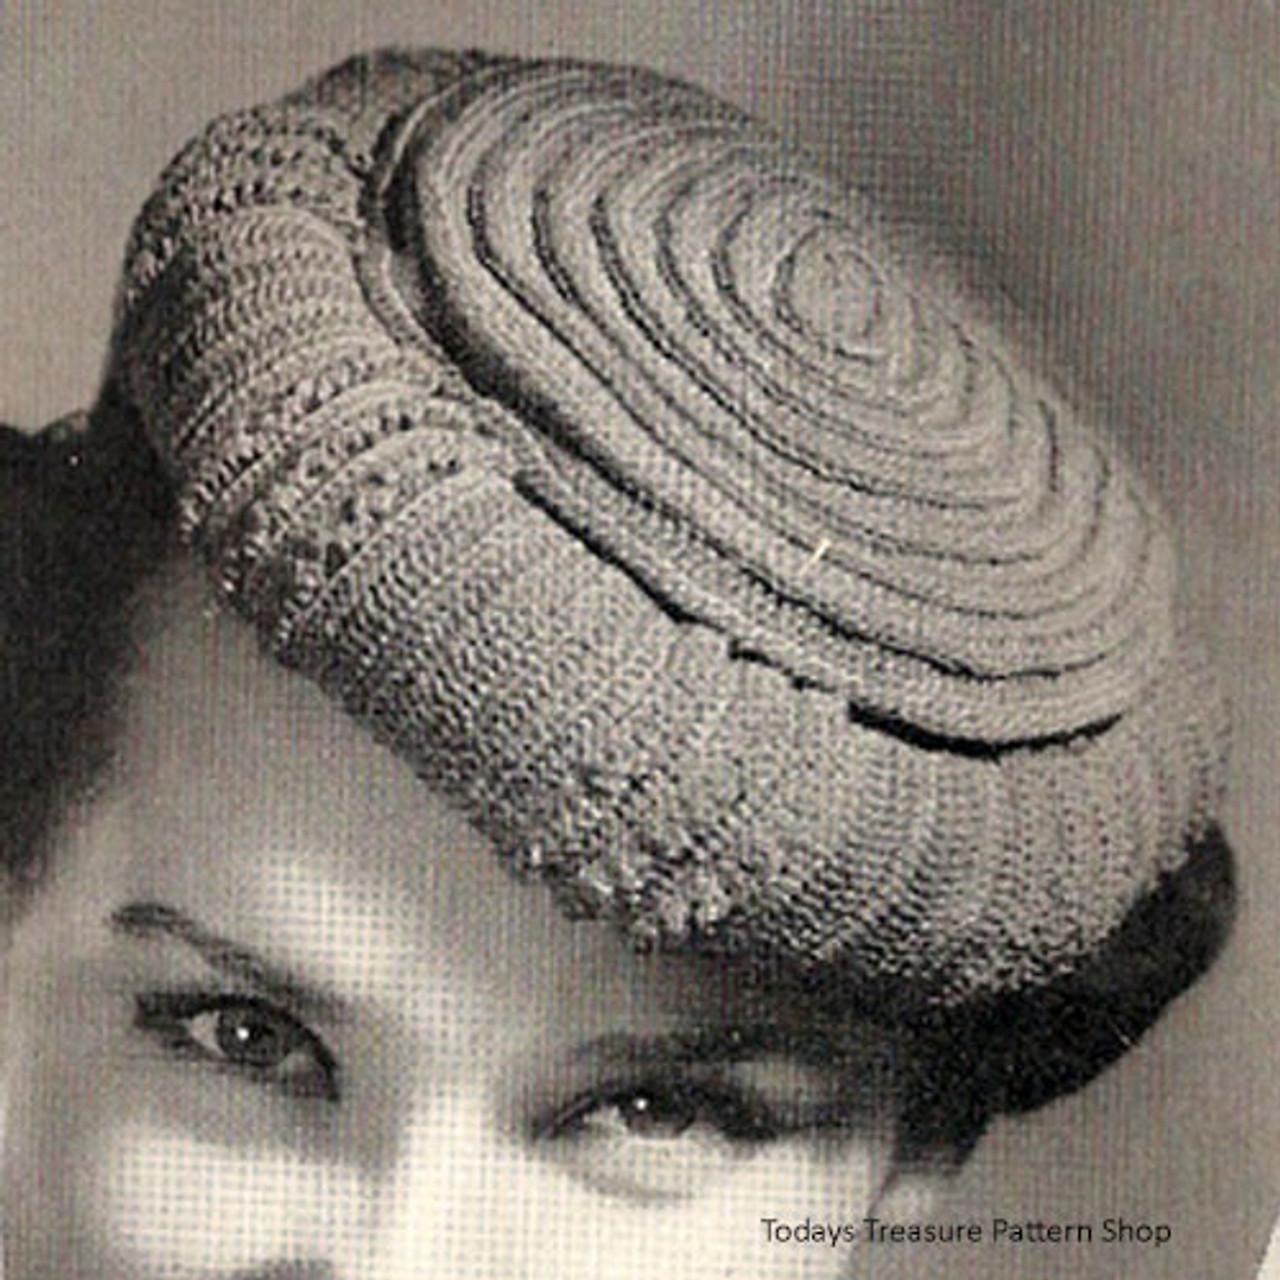 Rolled Pillbox Crochet Pattern